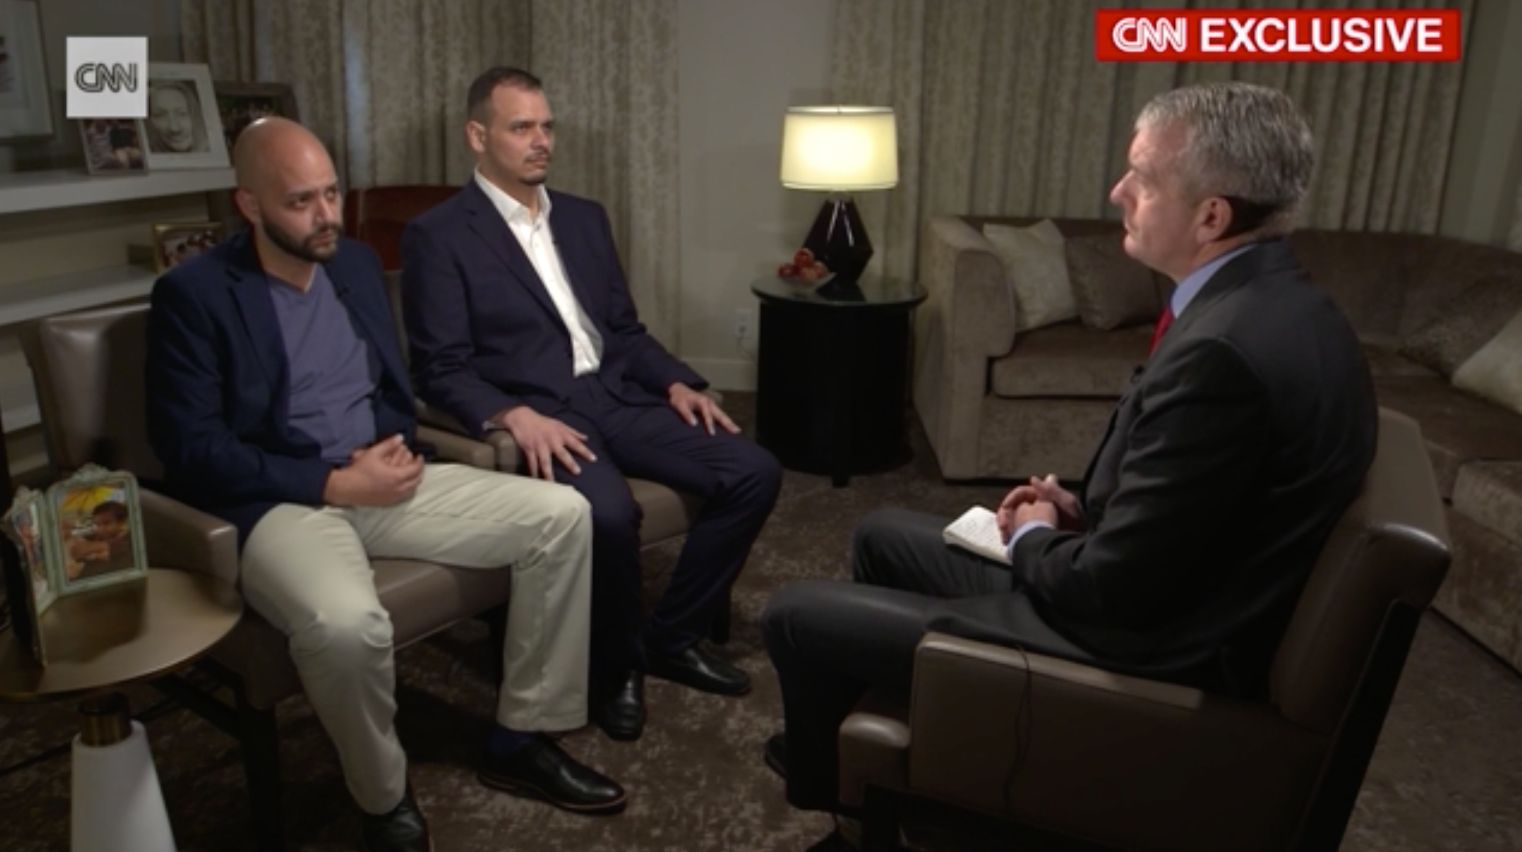 Abdullah Khashoggi (left) beside his brother, Salah Khashoggi (right) during an interview with CNN on Sunday.